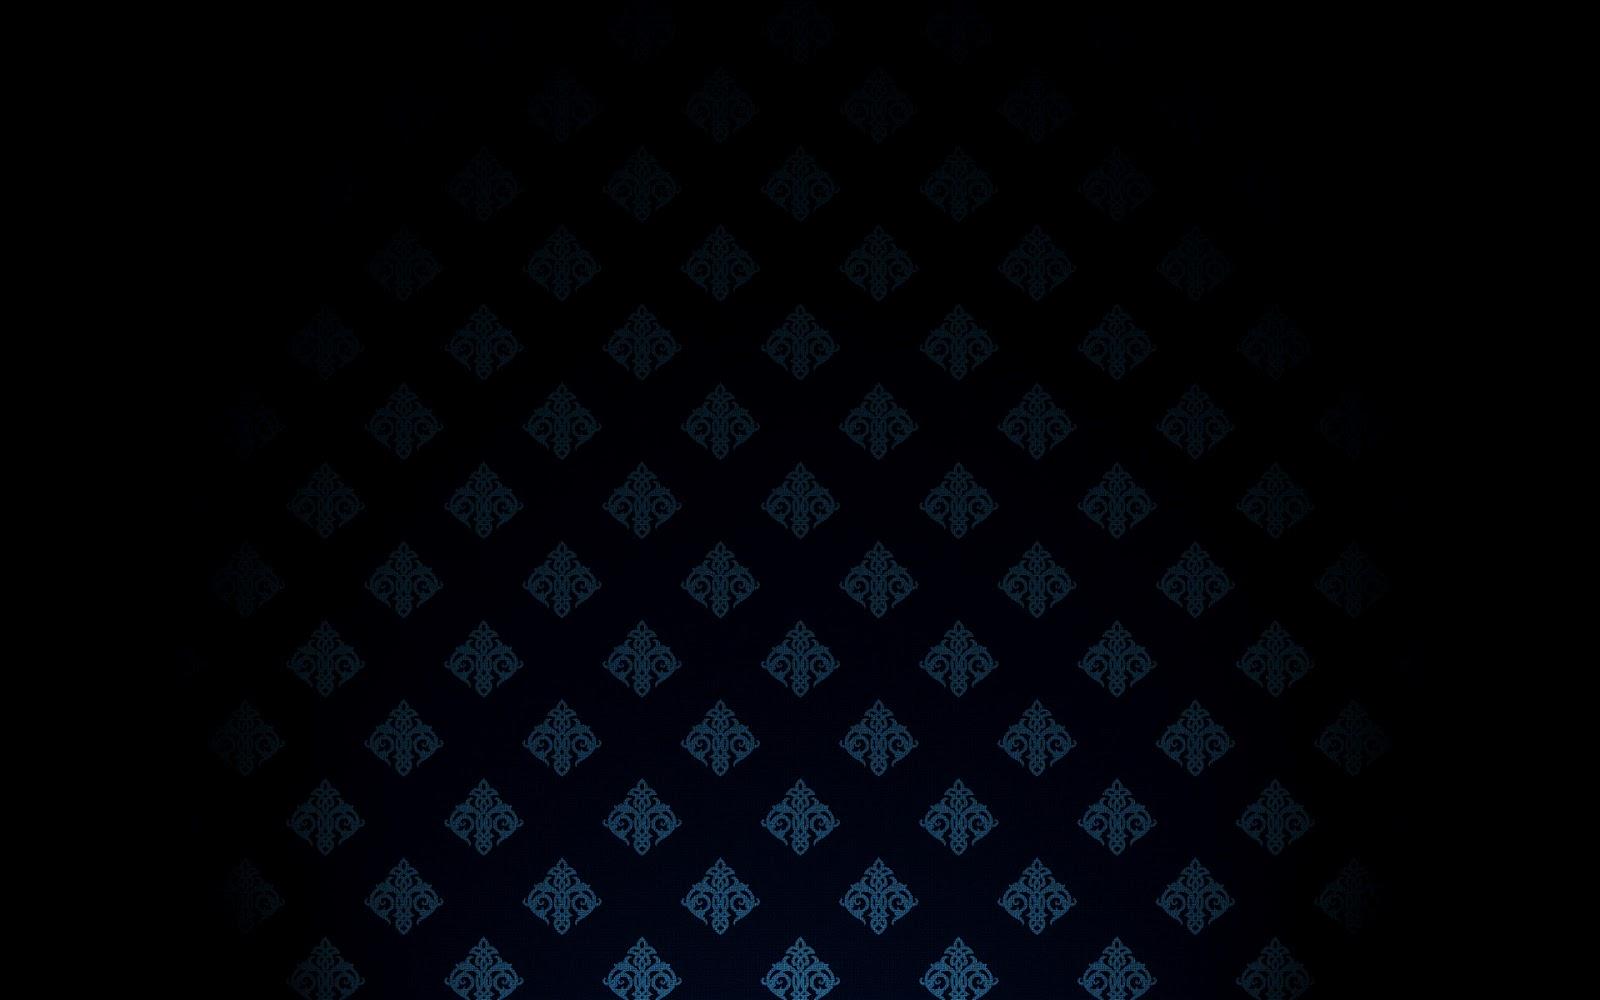 1000+ ideas about Black Background Wallpaper on Pinterest   Black